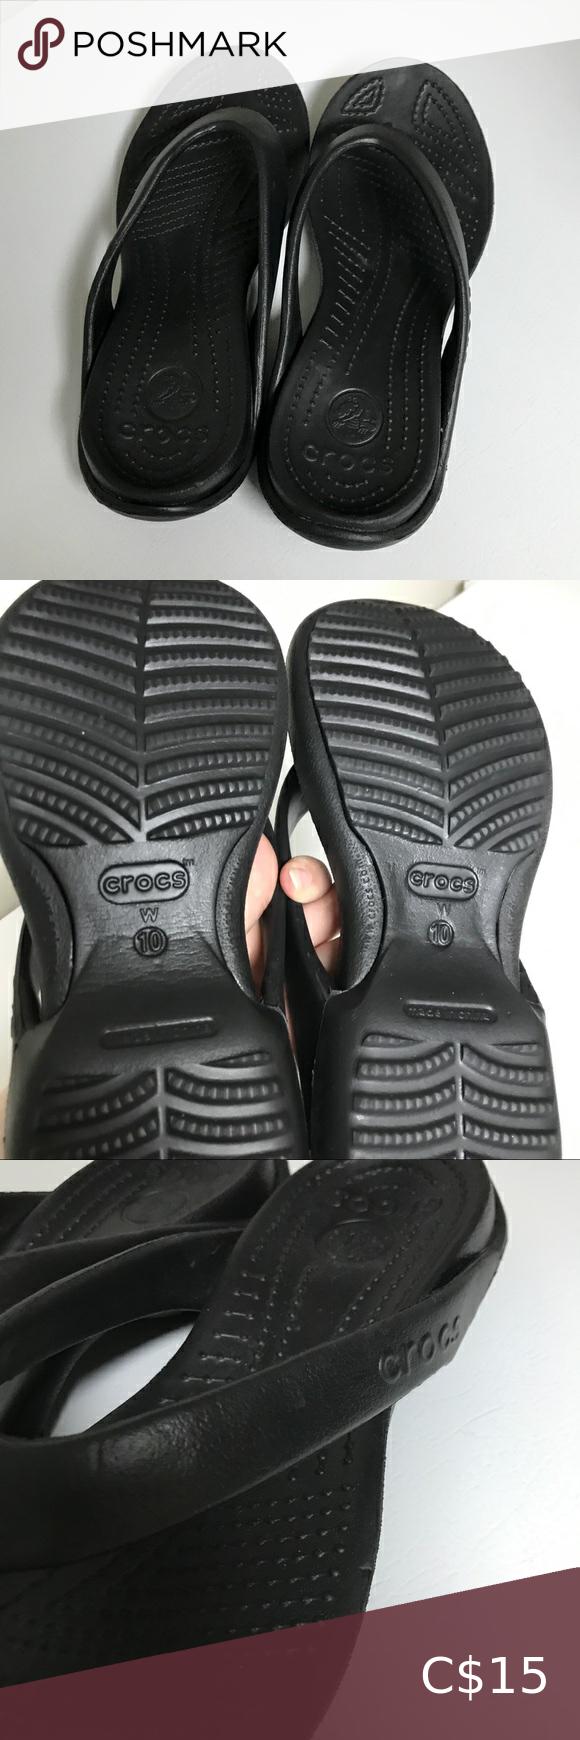 Crocs sandals / tongs / flip-flops for